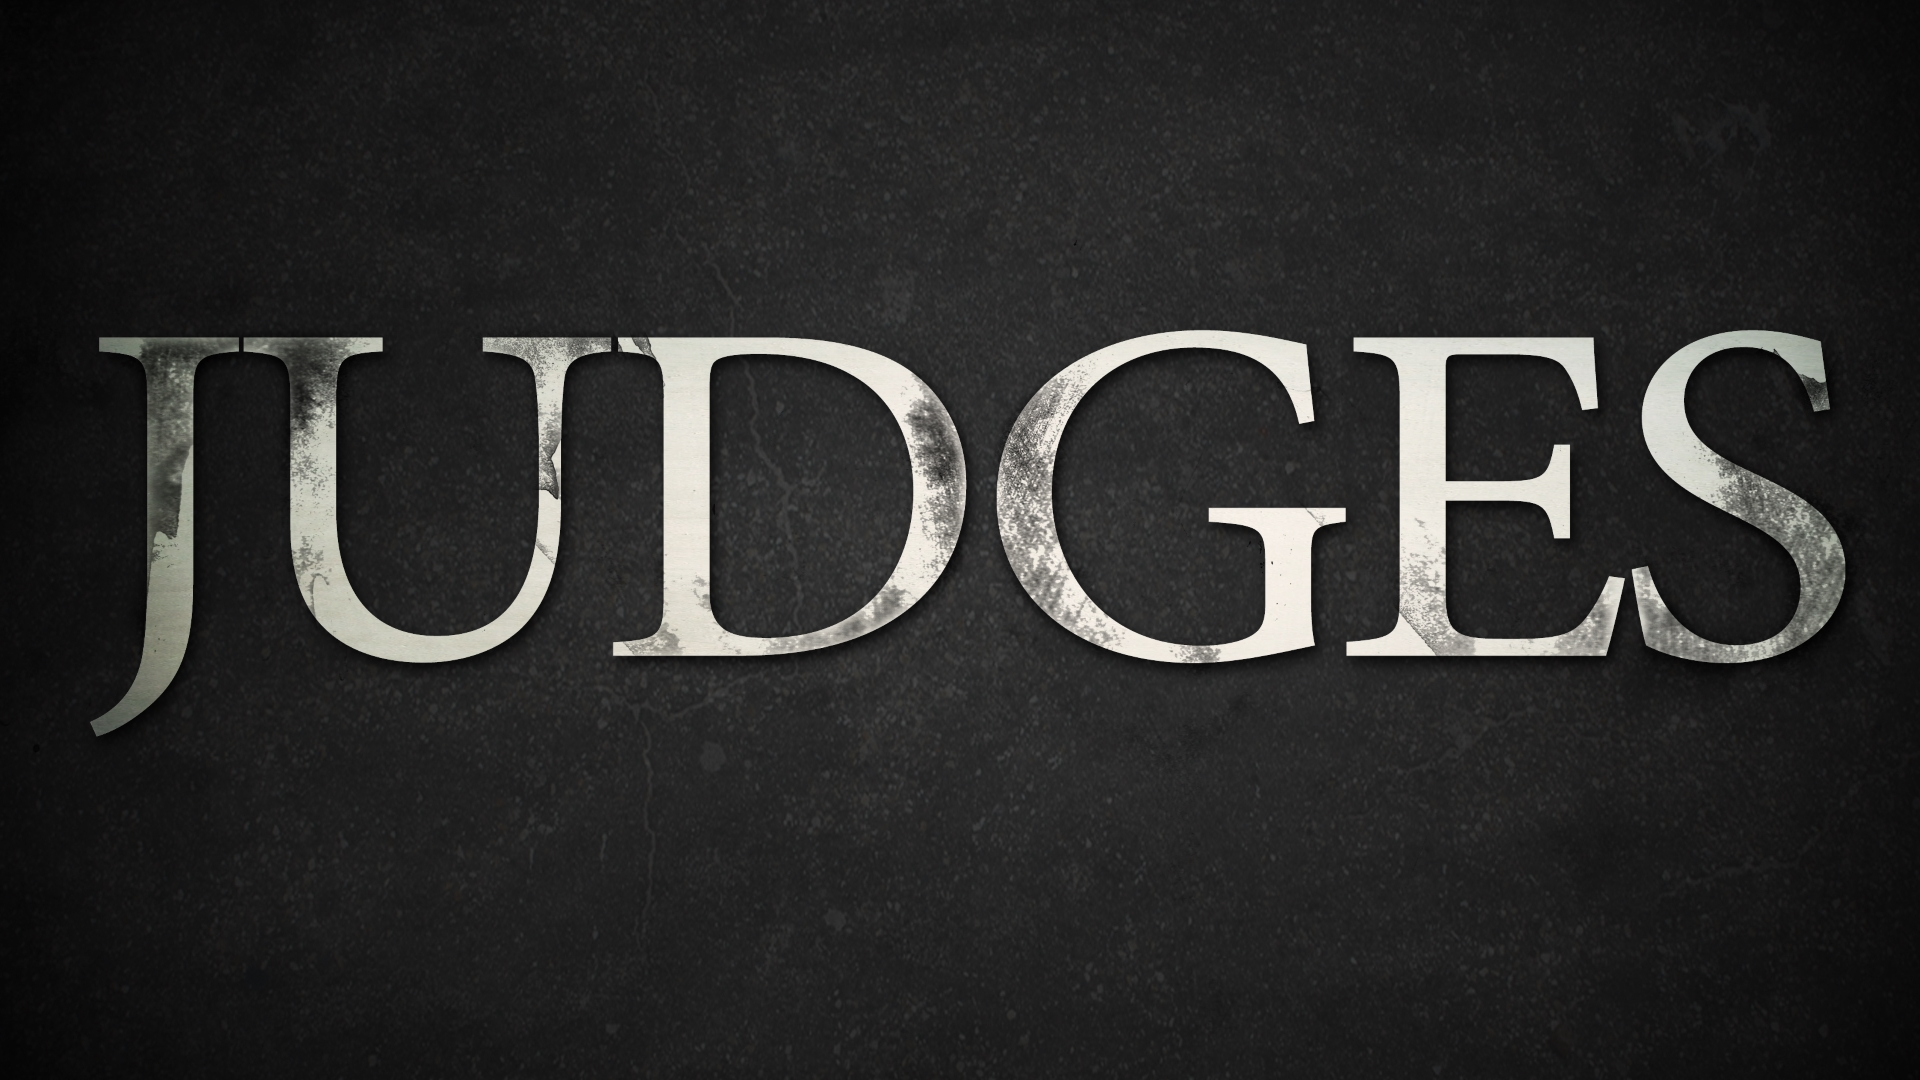 judges-banner-1920-1080.jpg